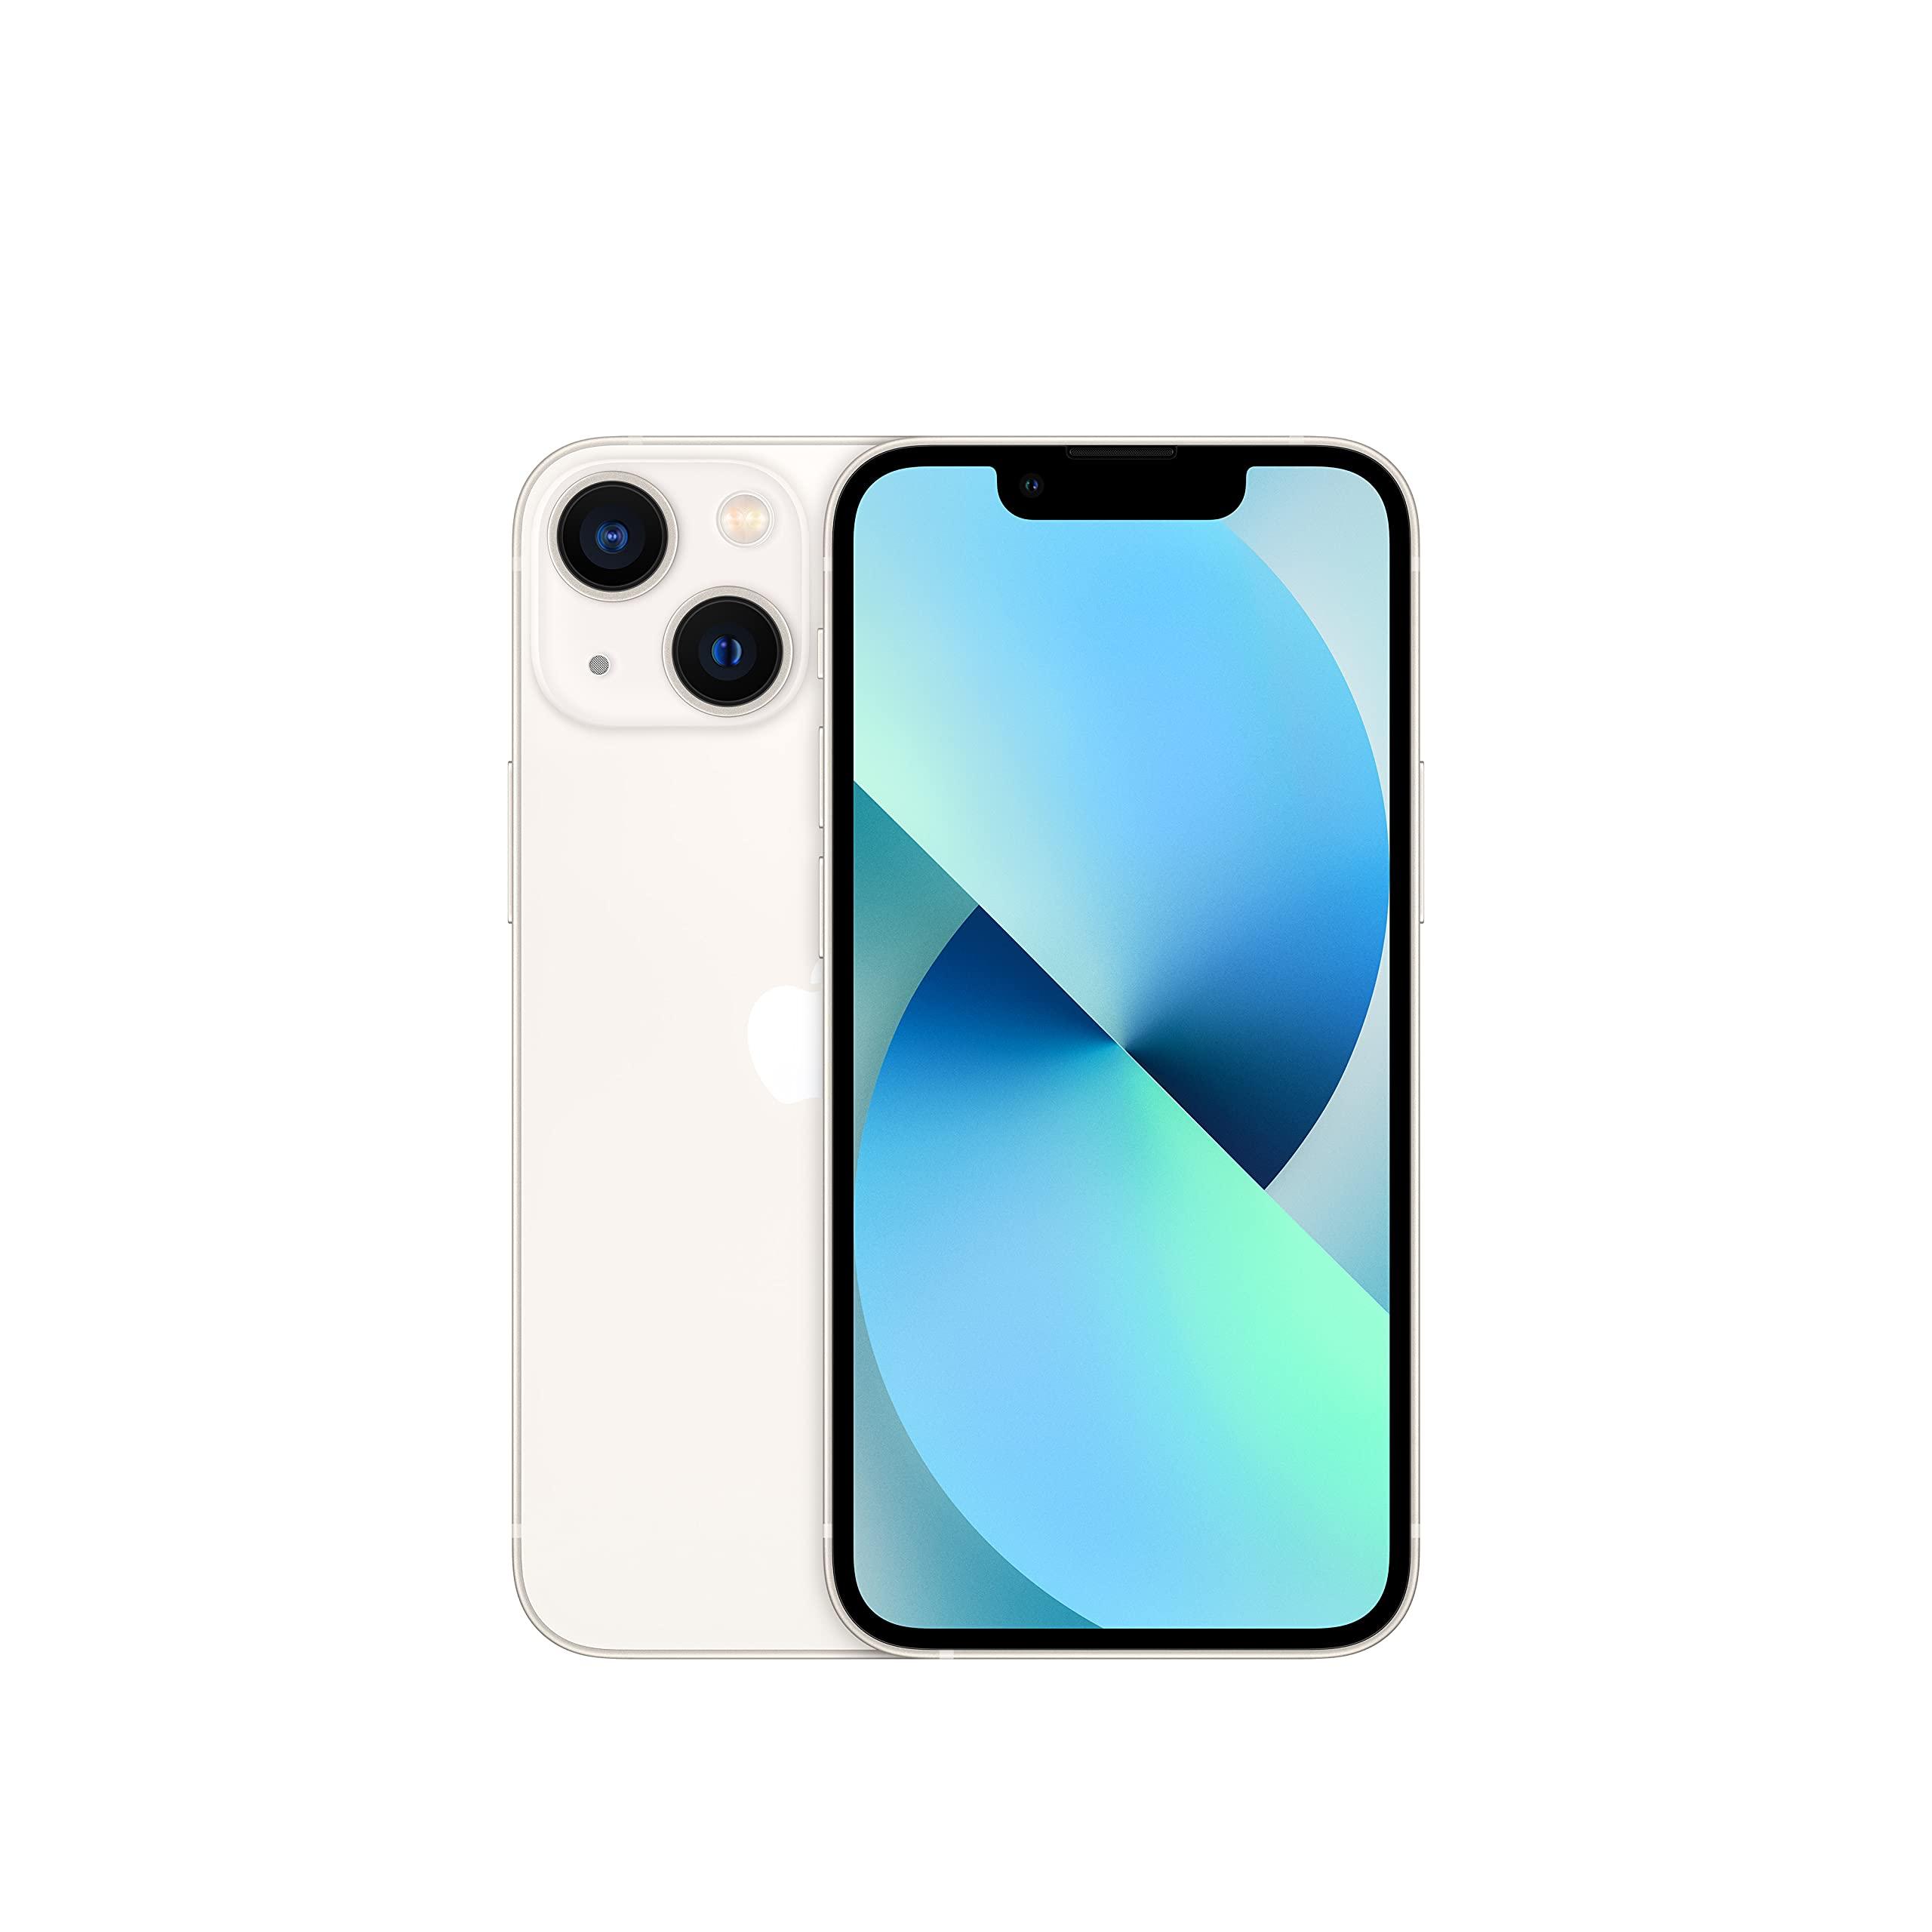 Apple iPhone 13 Mini (256GB) - Starlight